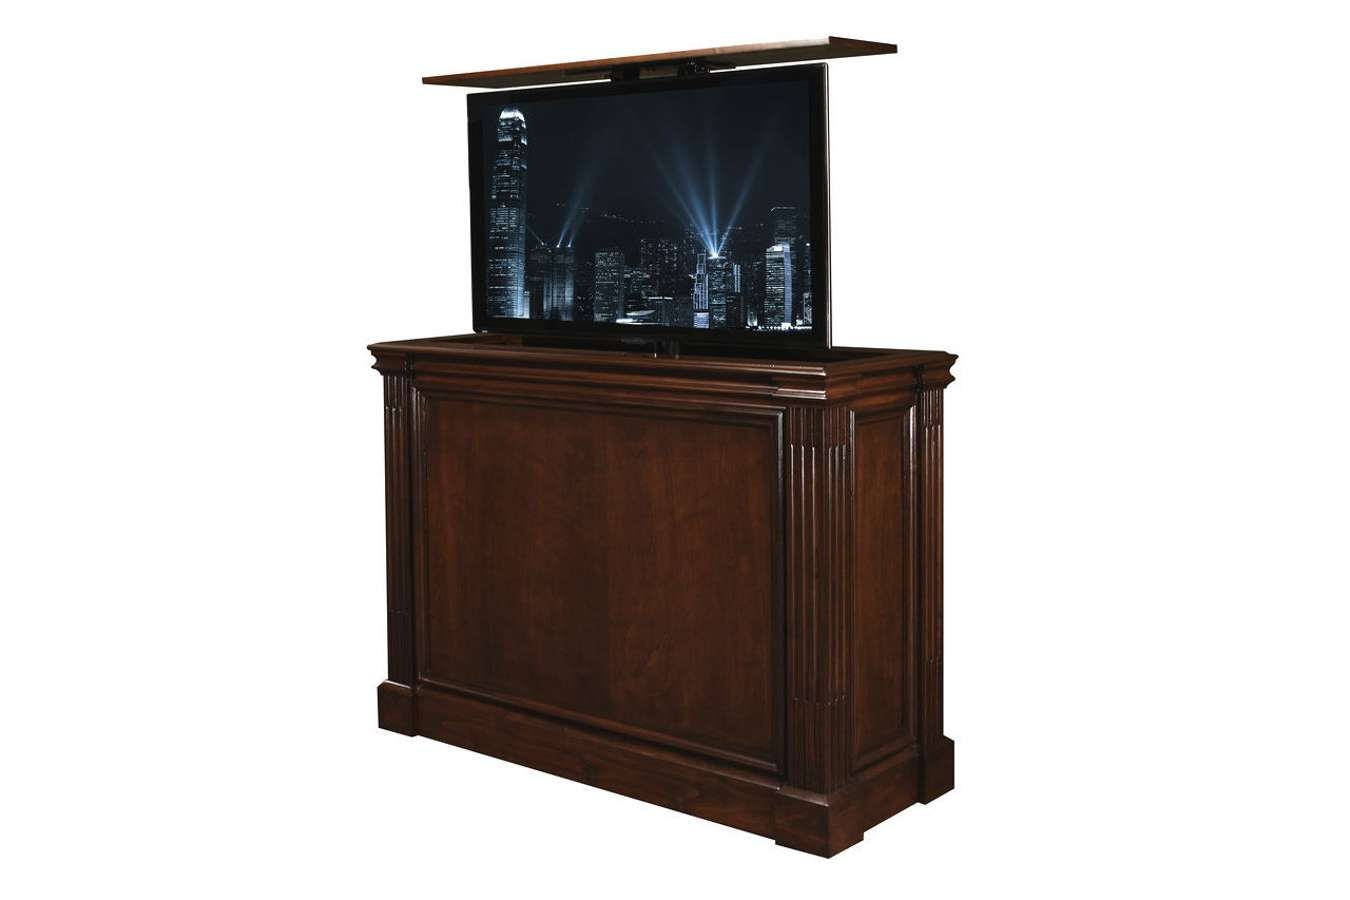 Hidden Tv Cabinet | Pop Up Tv Cabinet | Transitional Tv Cabinets Regarding Wenge Tv Cabinets (View 7 of 20)